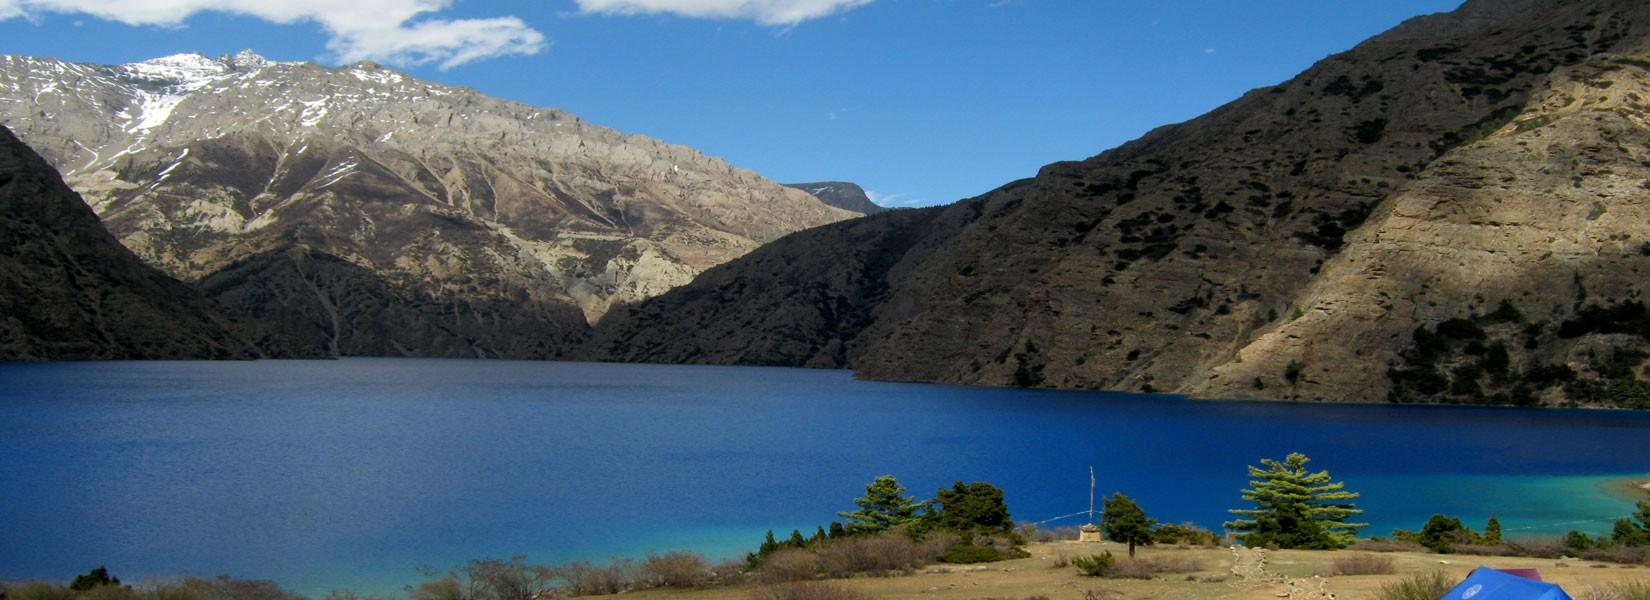 Shey Phoksundo Lake view